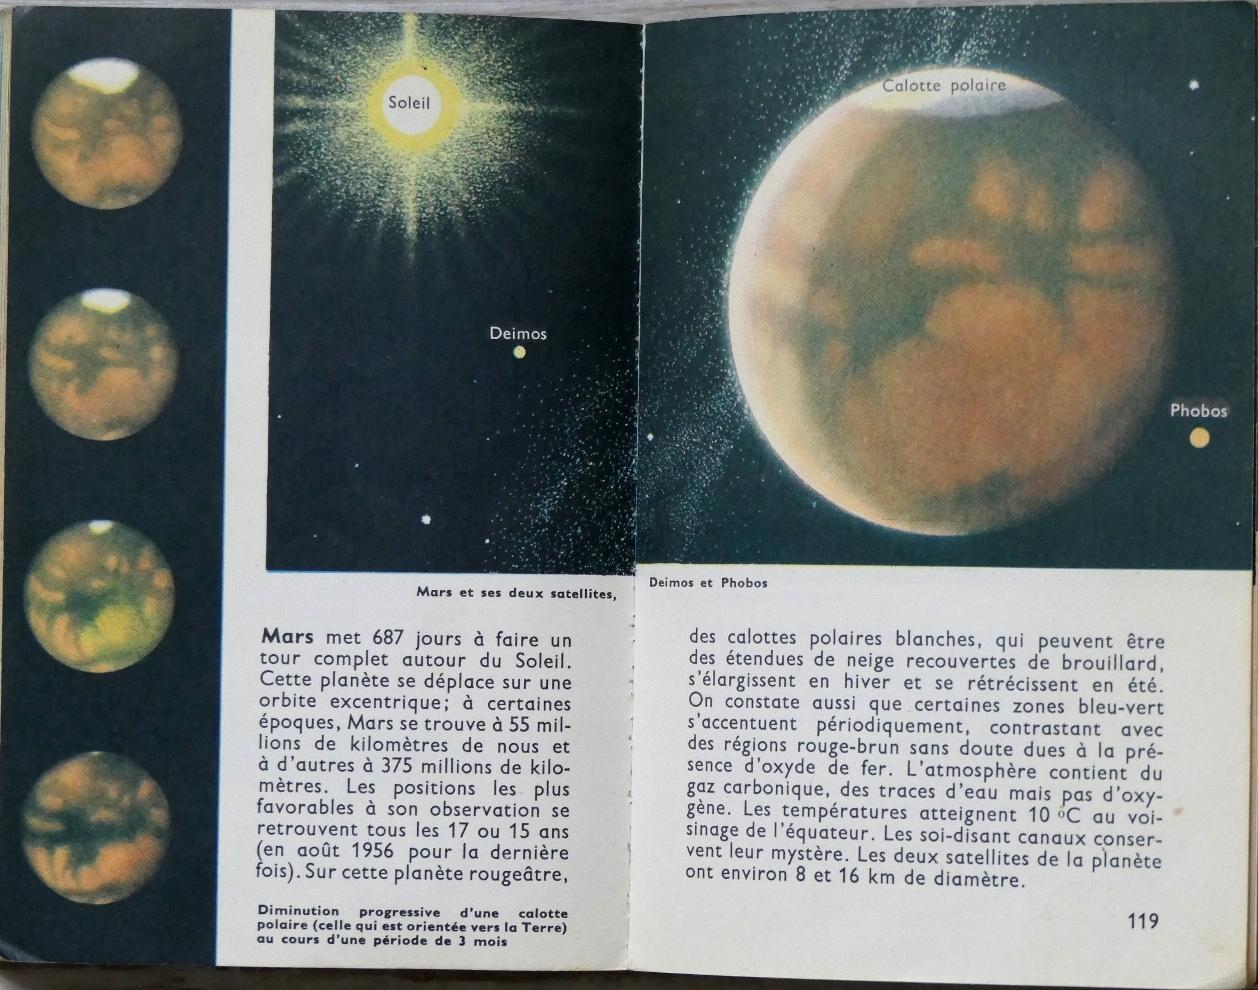 Etoiles_Hachette_1963_Mars_P1080722.JPG.d6991819ab1d5d1731c70ddfc47cd03b.JPG